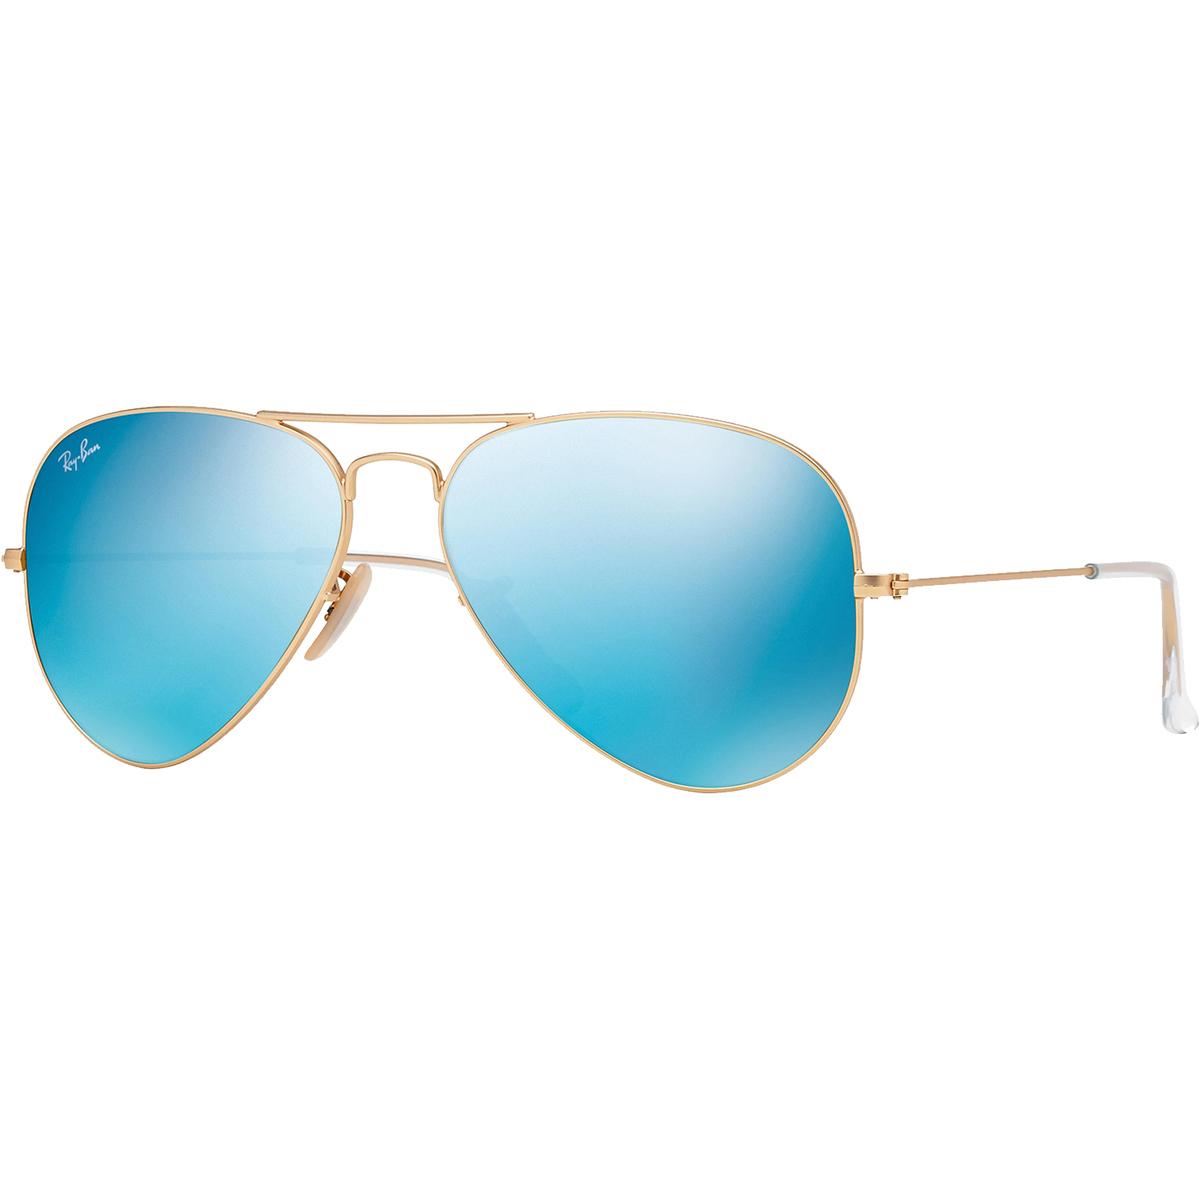 2358db611e3c1 Ray-Ban Aviator Sunglasses - Gold Blue Flash Lenses - 0RB30251121758 ...